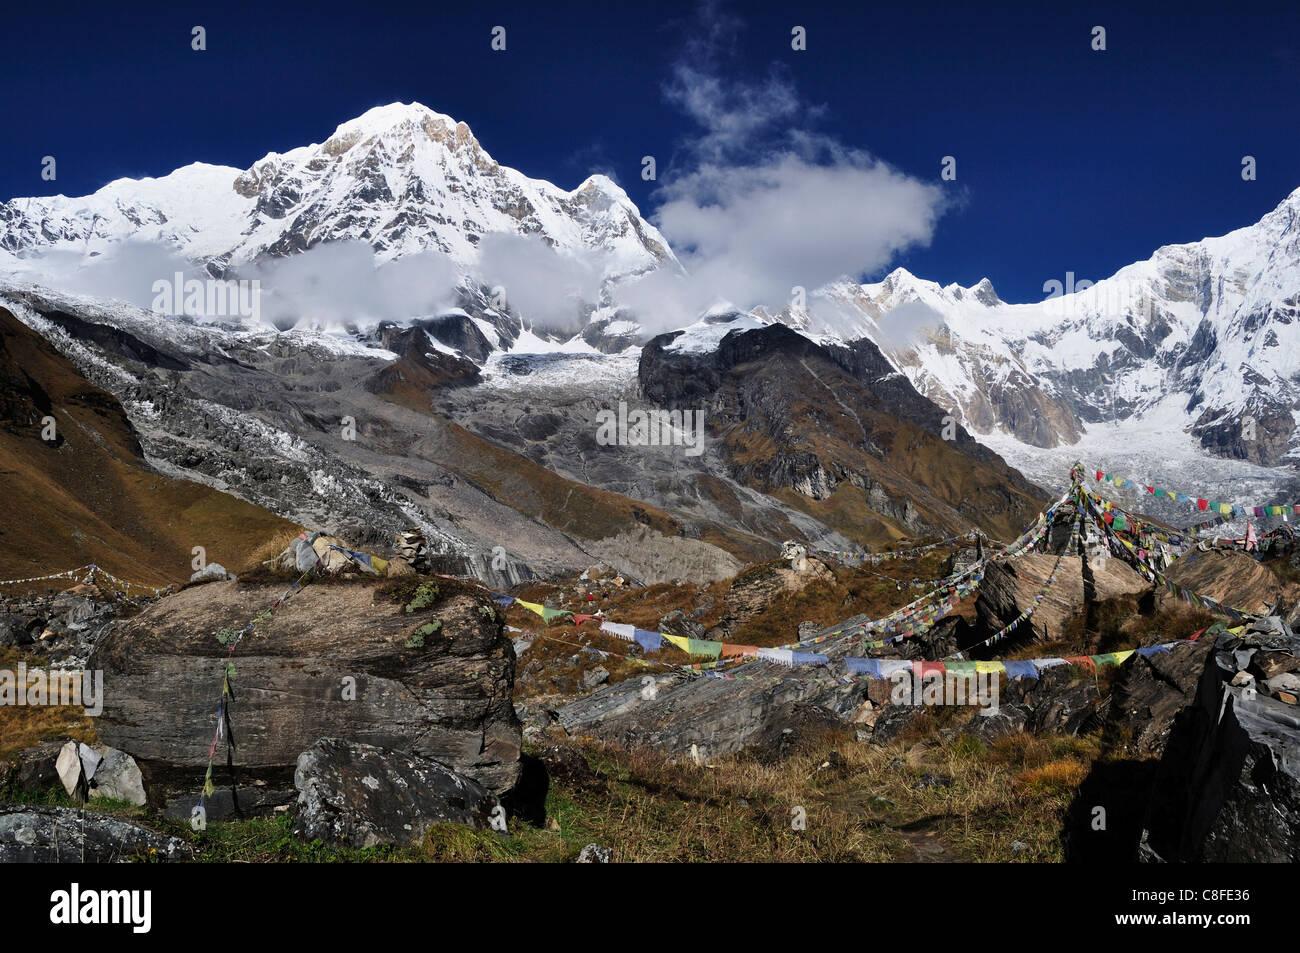 Annapurna Himalayan Range seen from Annapurna Base Camp, Annapurna Conservation Area, Gandaki, (Pashchimanchal, - Stock Image